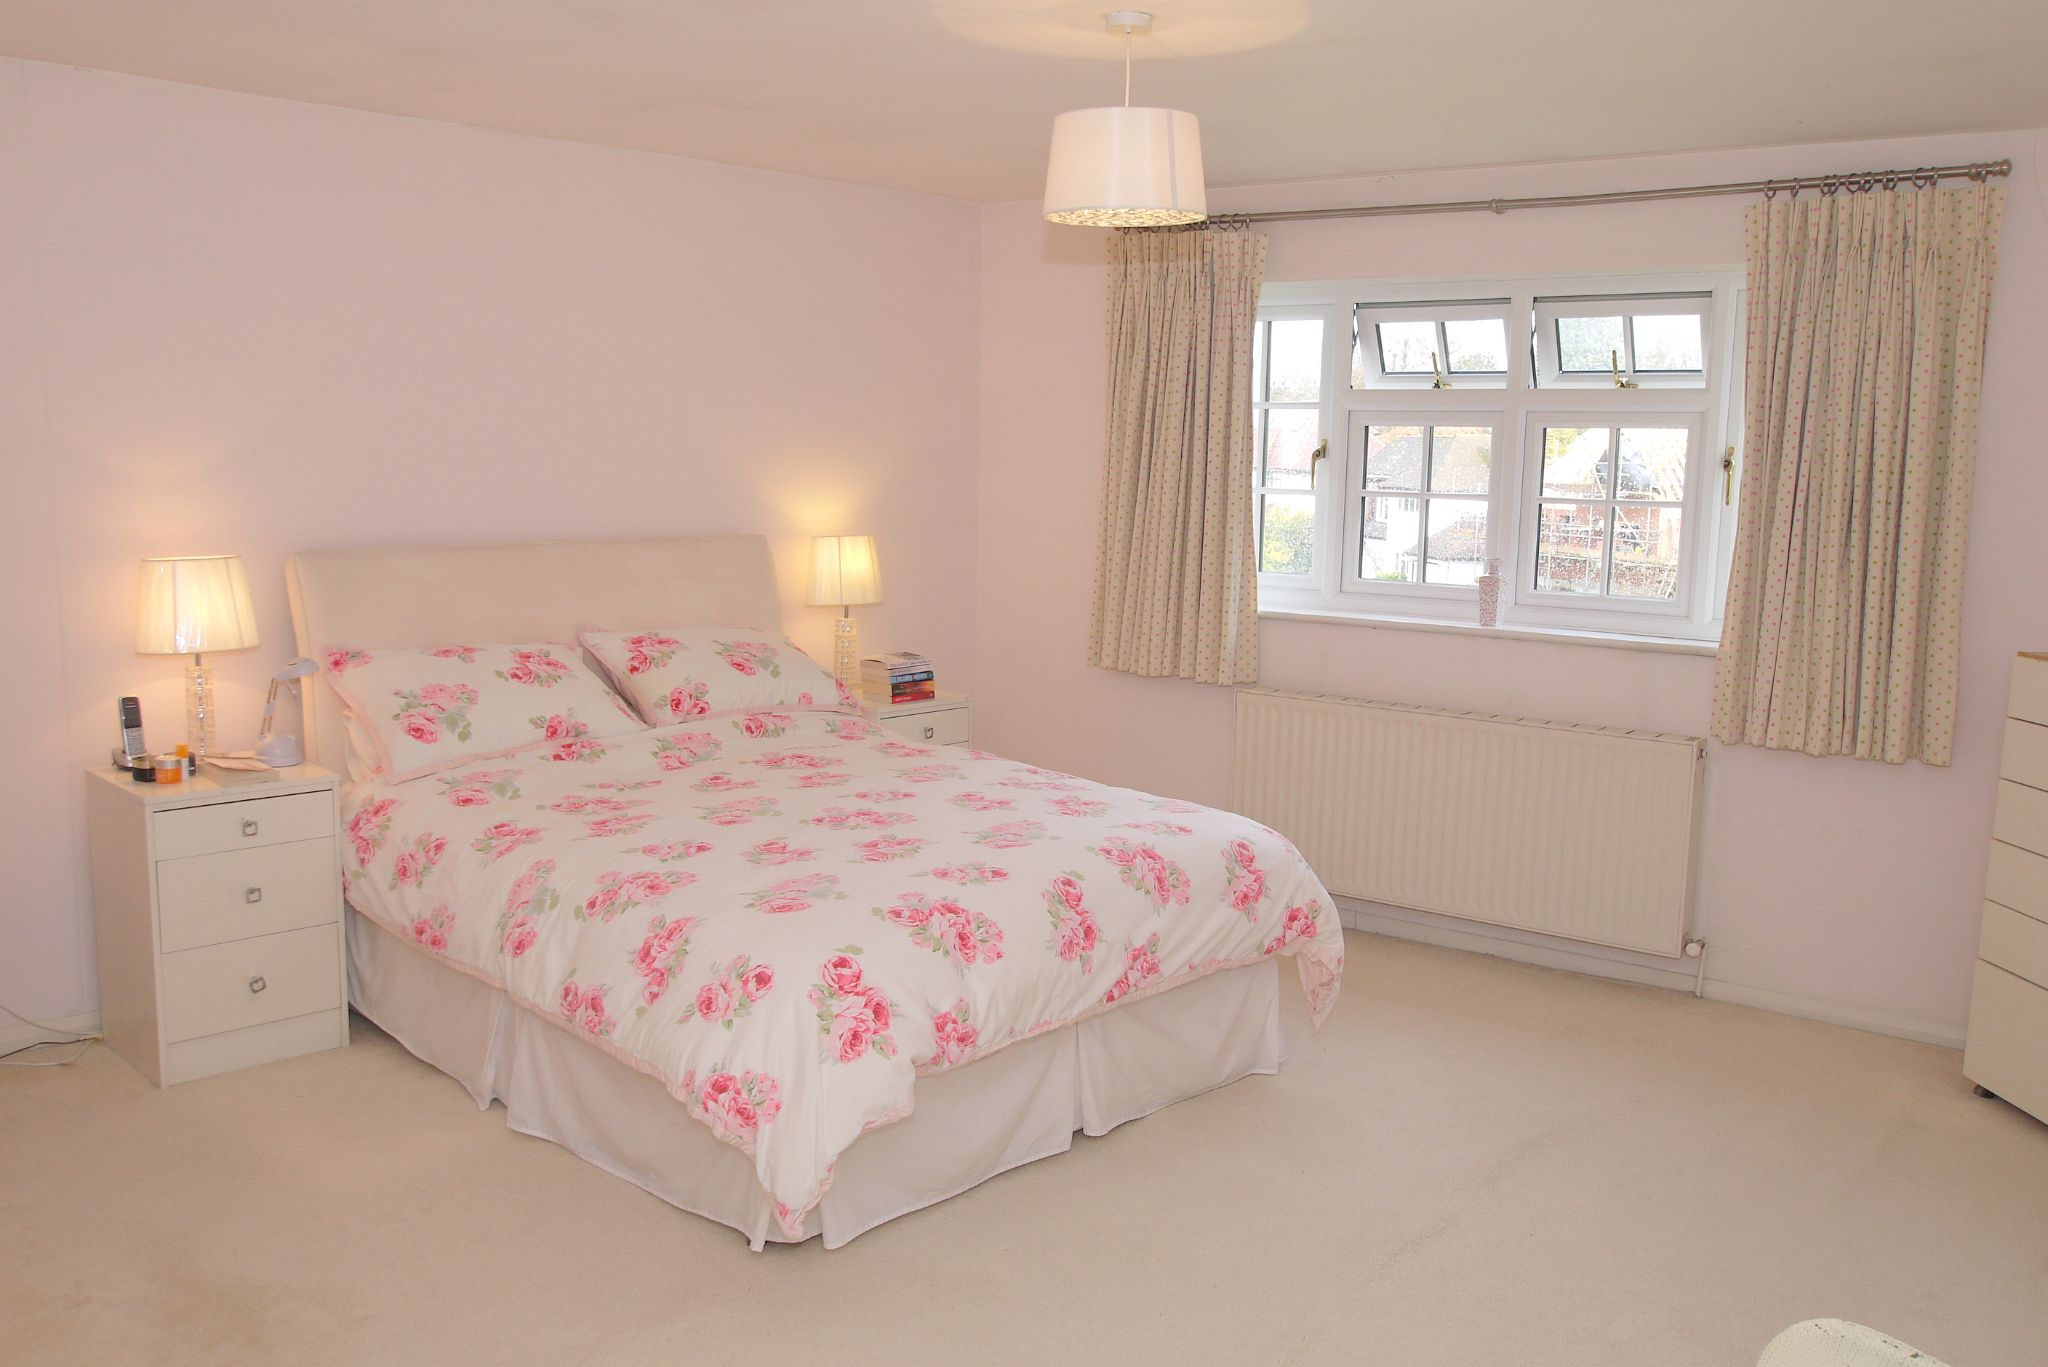 4 bedroom detached house Sold in Sevenoaks - Photograph 9